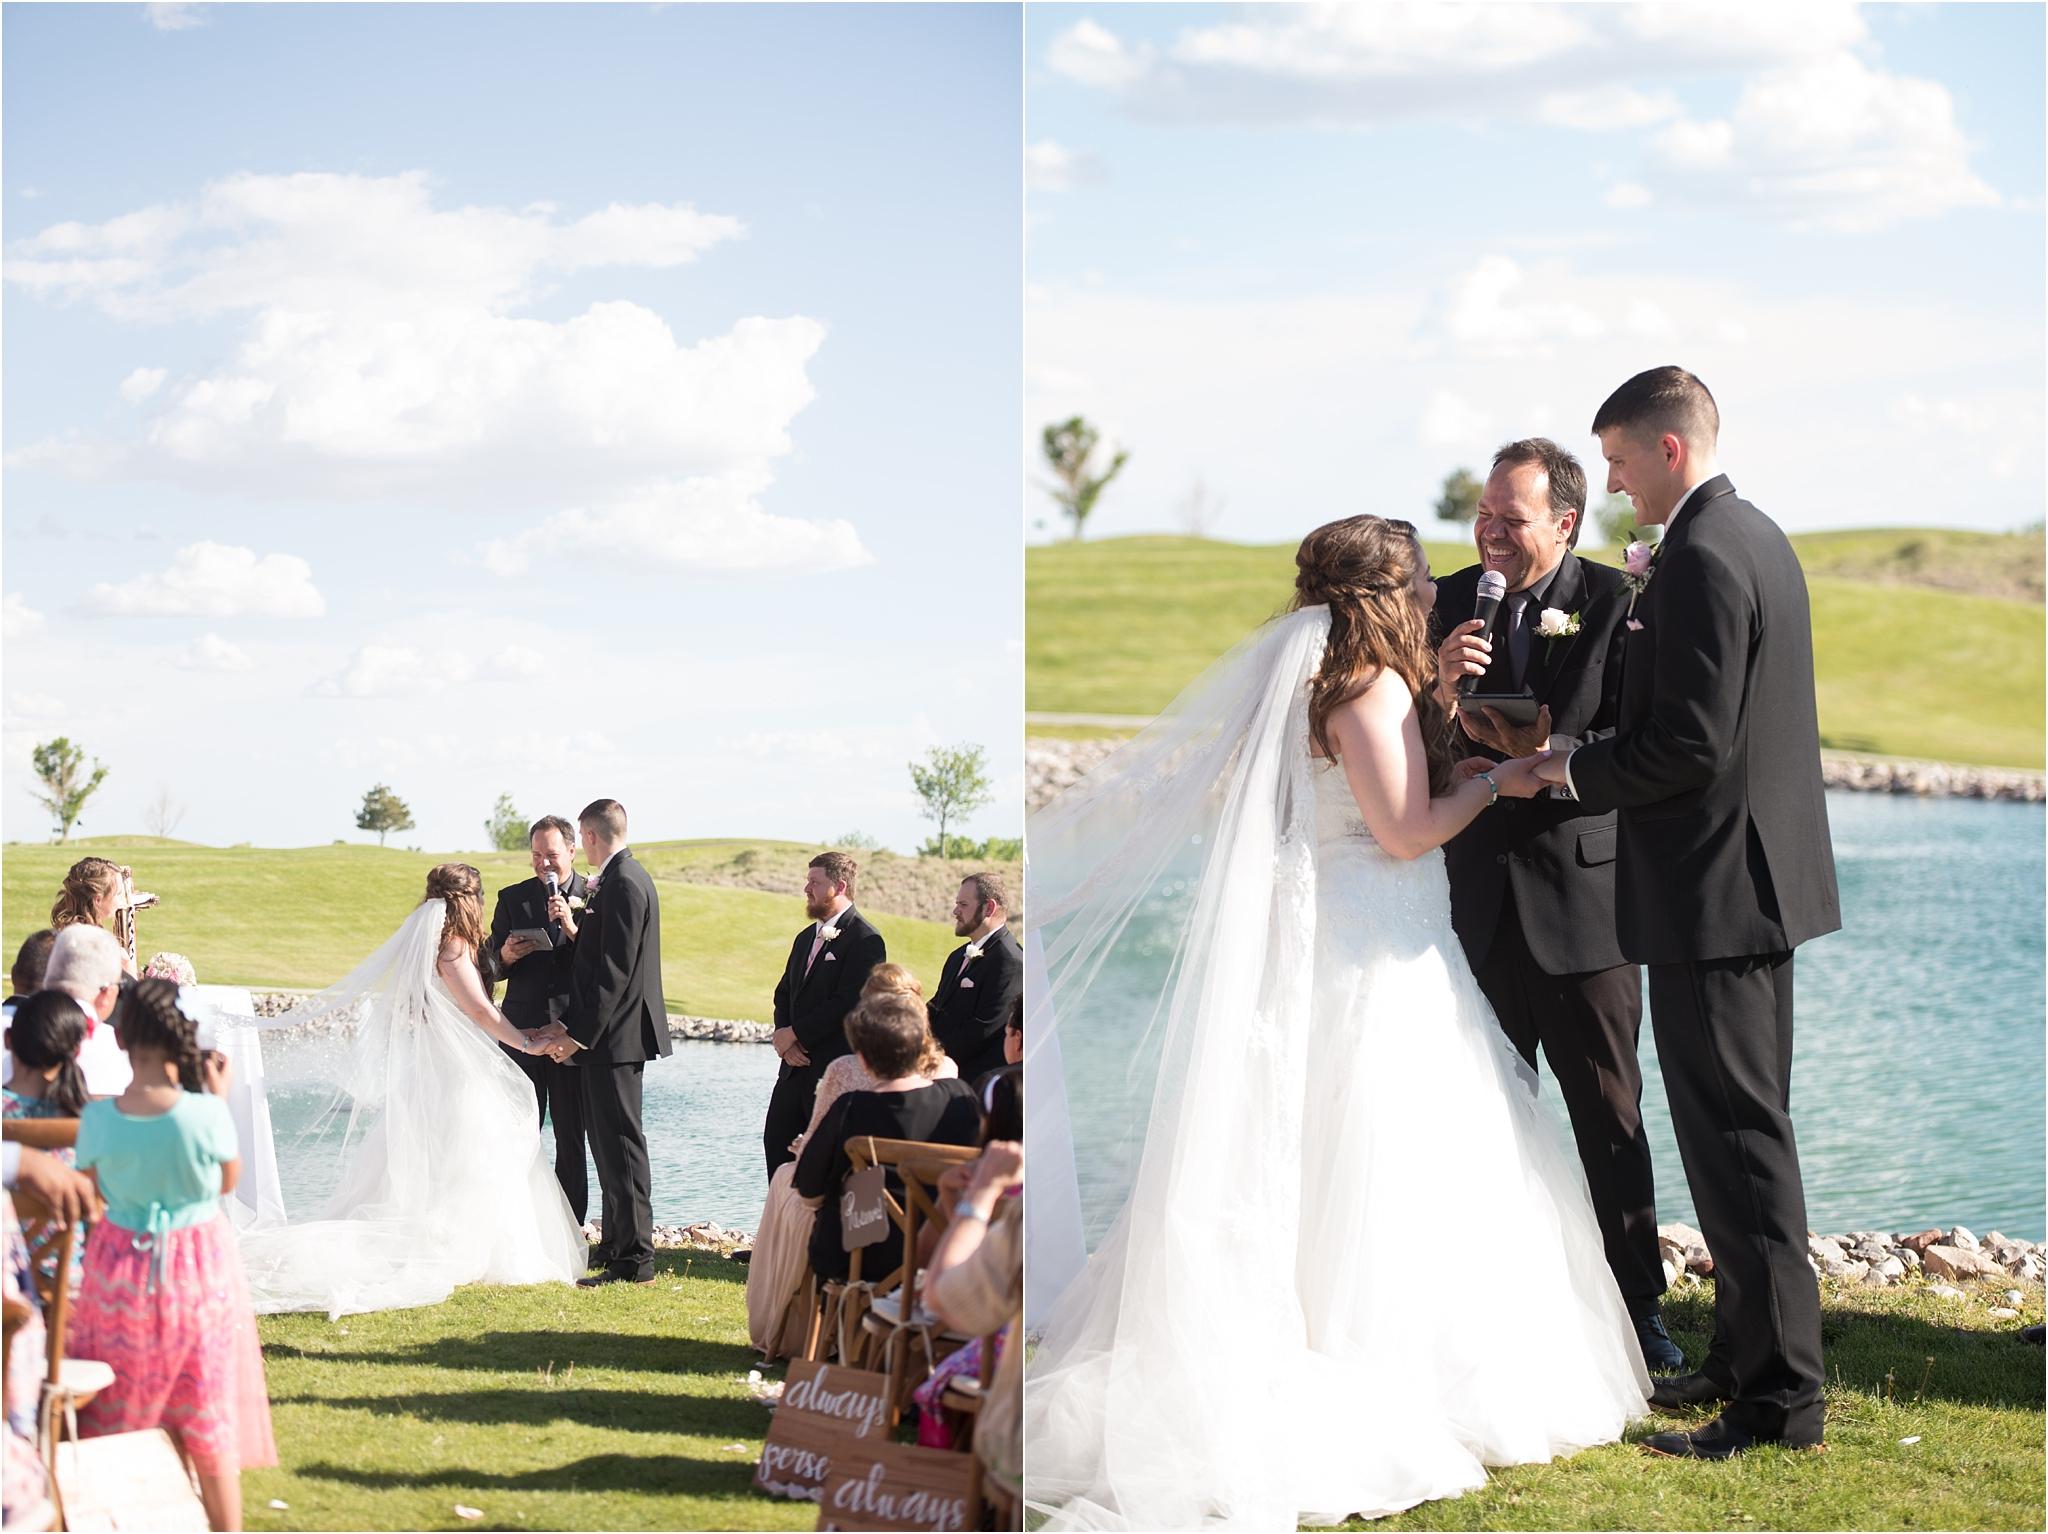 kayla kitts photography - isleta casino wedding - albuquerque wedding photographer - new mexico wedding photographer - de novo pastoral_0028.jpg